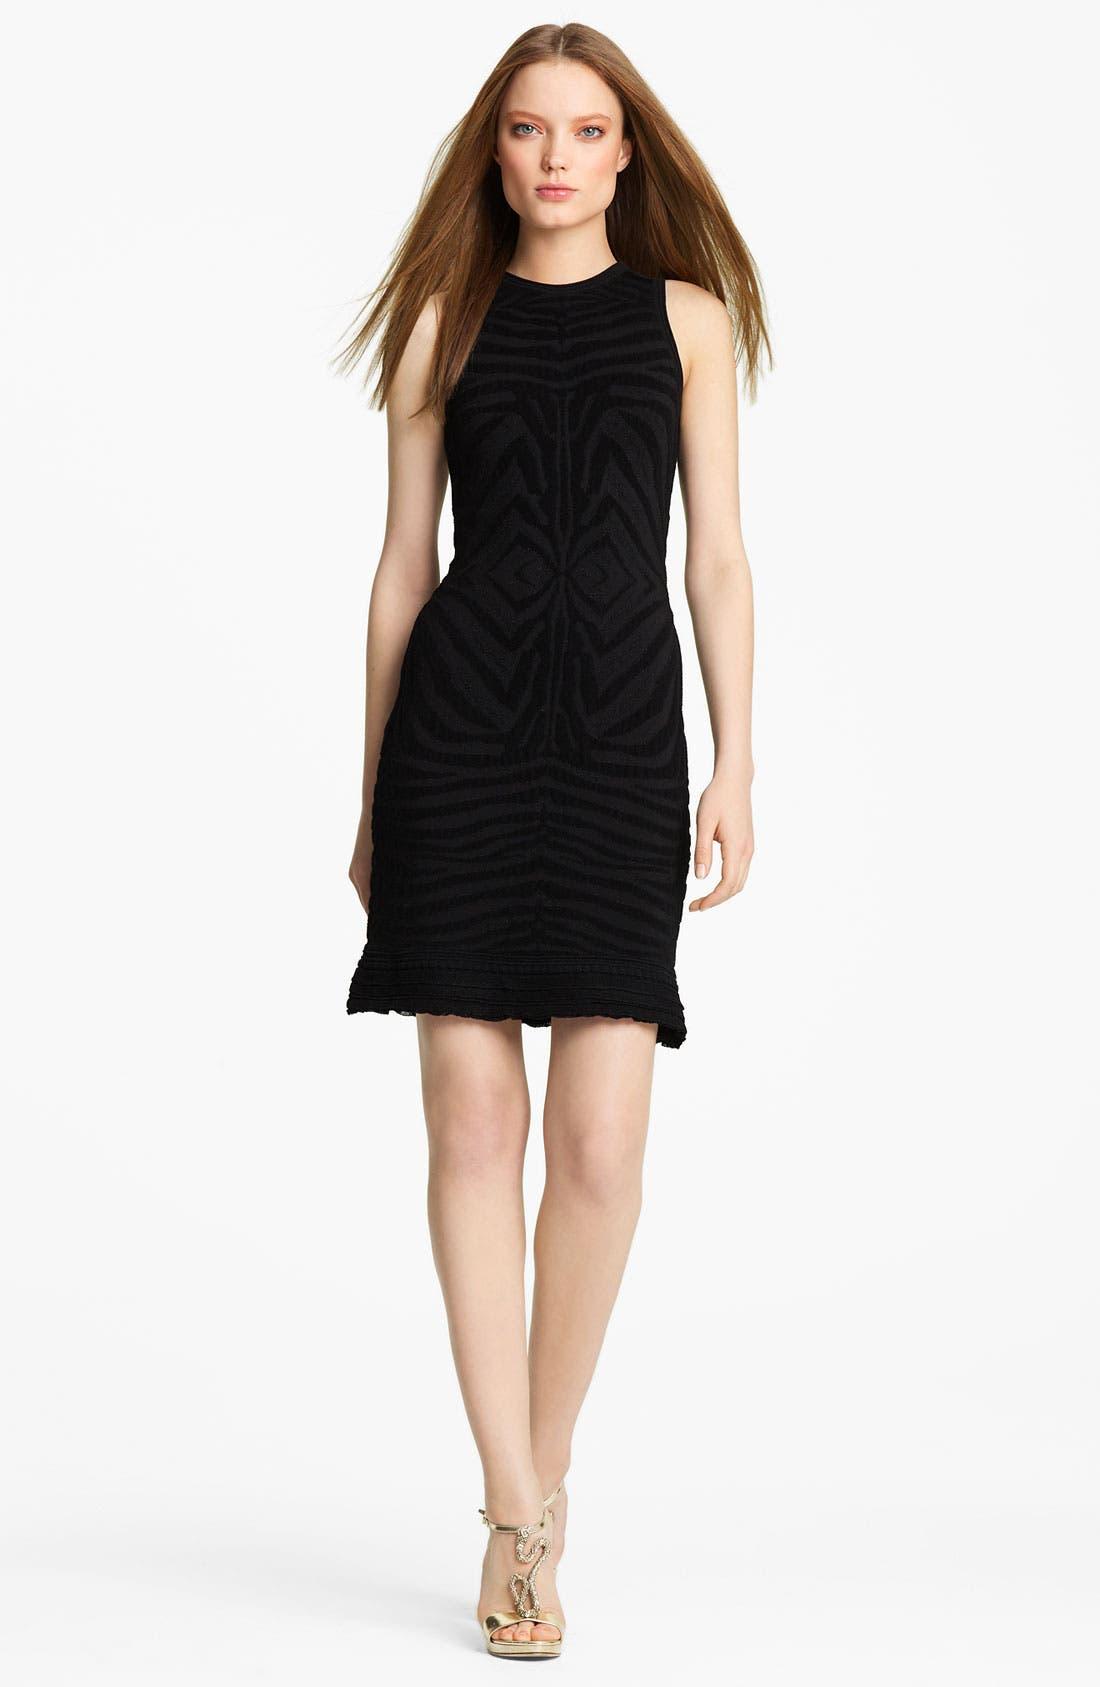 Alternate Image 1 Selected - Roberto Cavalli Zebra Knit Dress